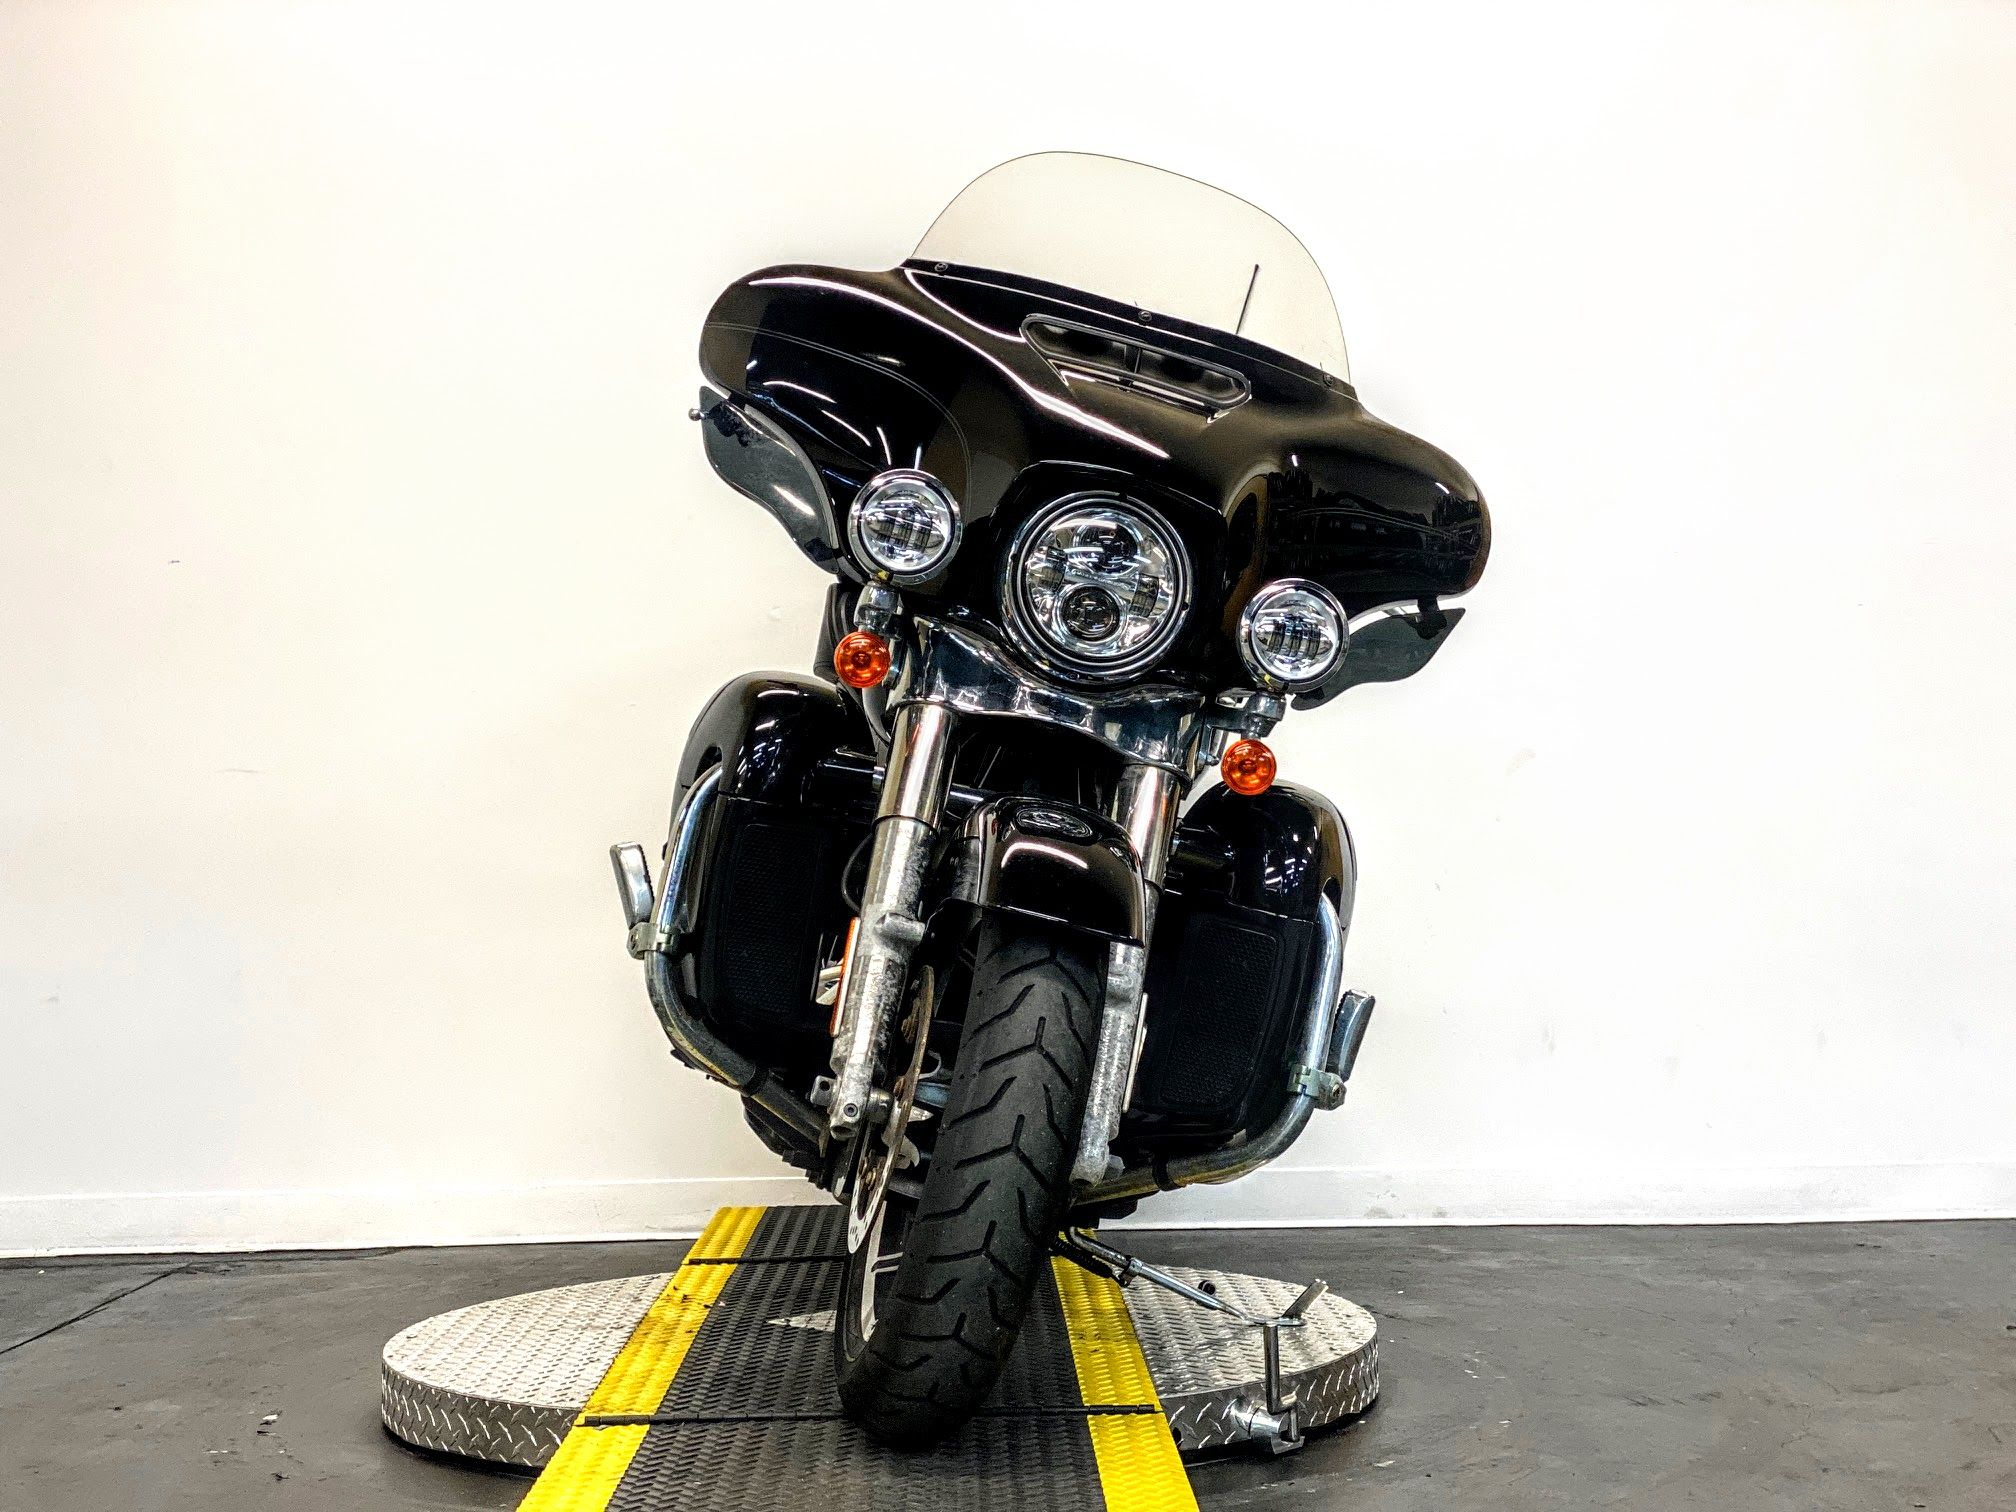 Pre-Owned 2019 Harley-Davidson Road Glide Ultra FLTRU